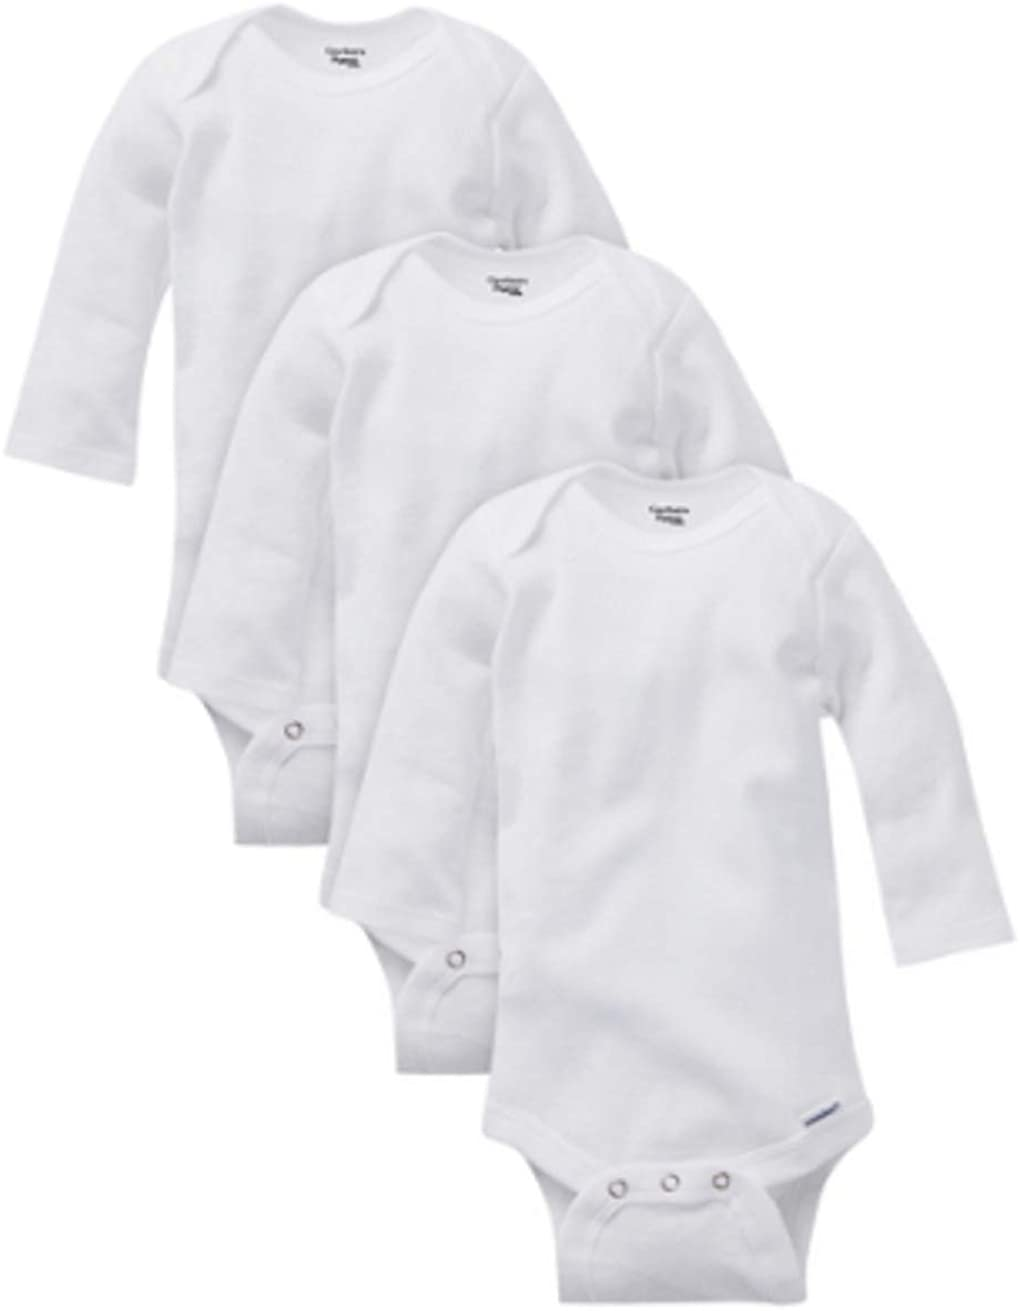 Gerber White Organic Cotton Long Sleeve Onesies Bodysuits, Preemie 3pk (Baby Boys or Baby Girls, Unisex) Preemie